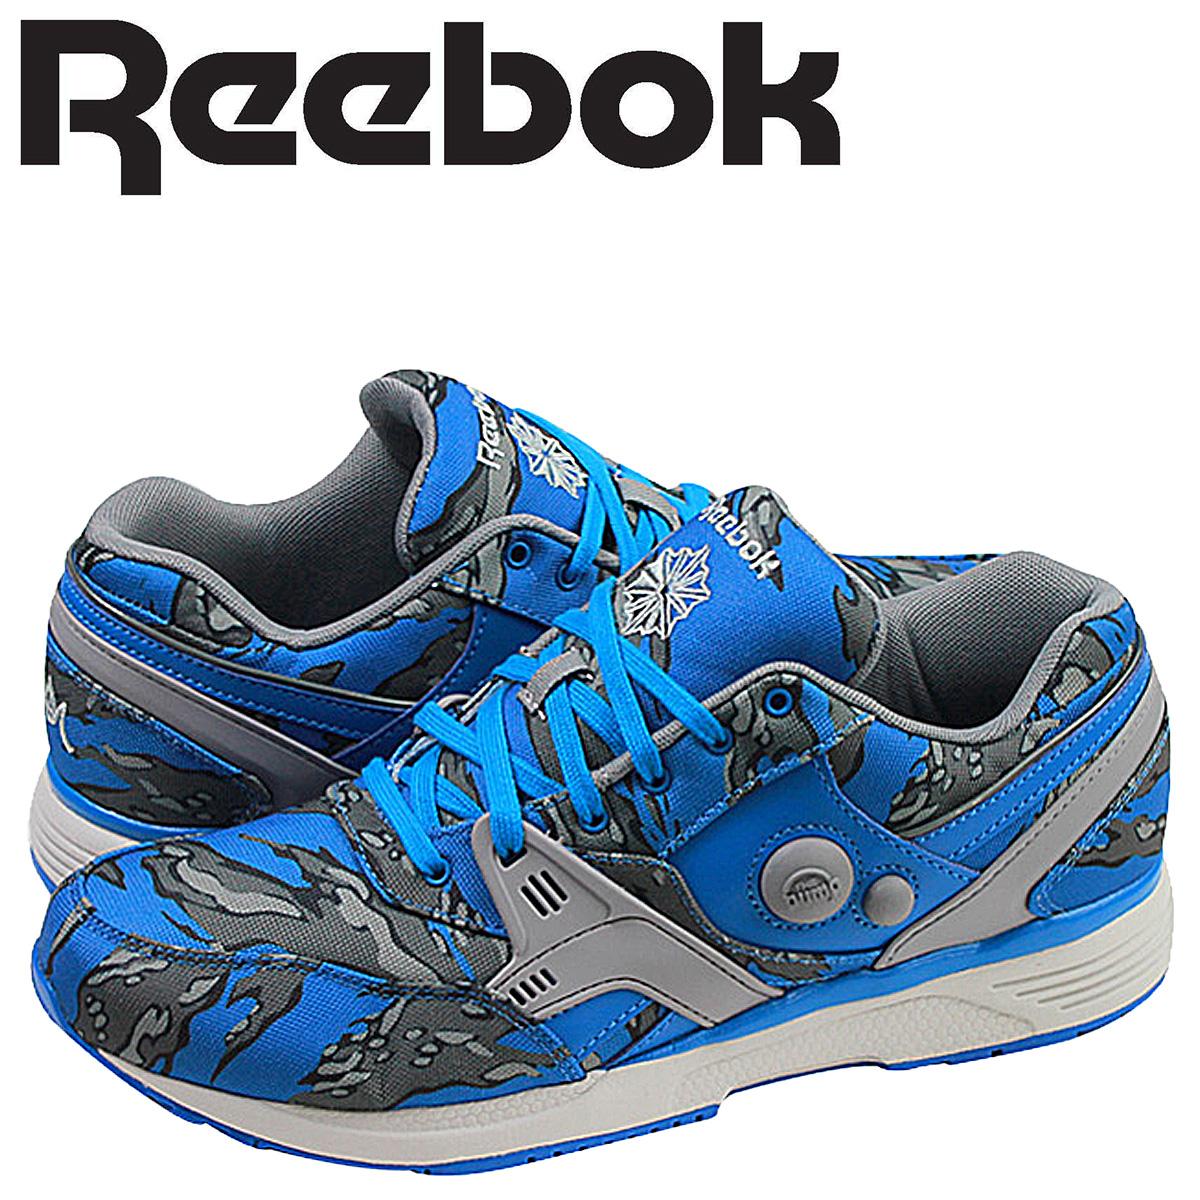 Reebok リーボック ポンプ スニーカー PUMP RUNNING DUAL STASH COLLECTION V61555 メンズ 靴 ブルー 【決算セール 返品不可】